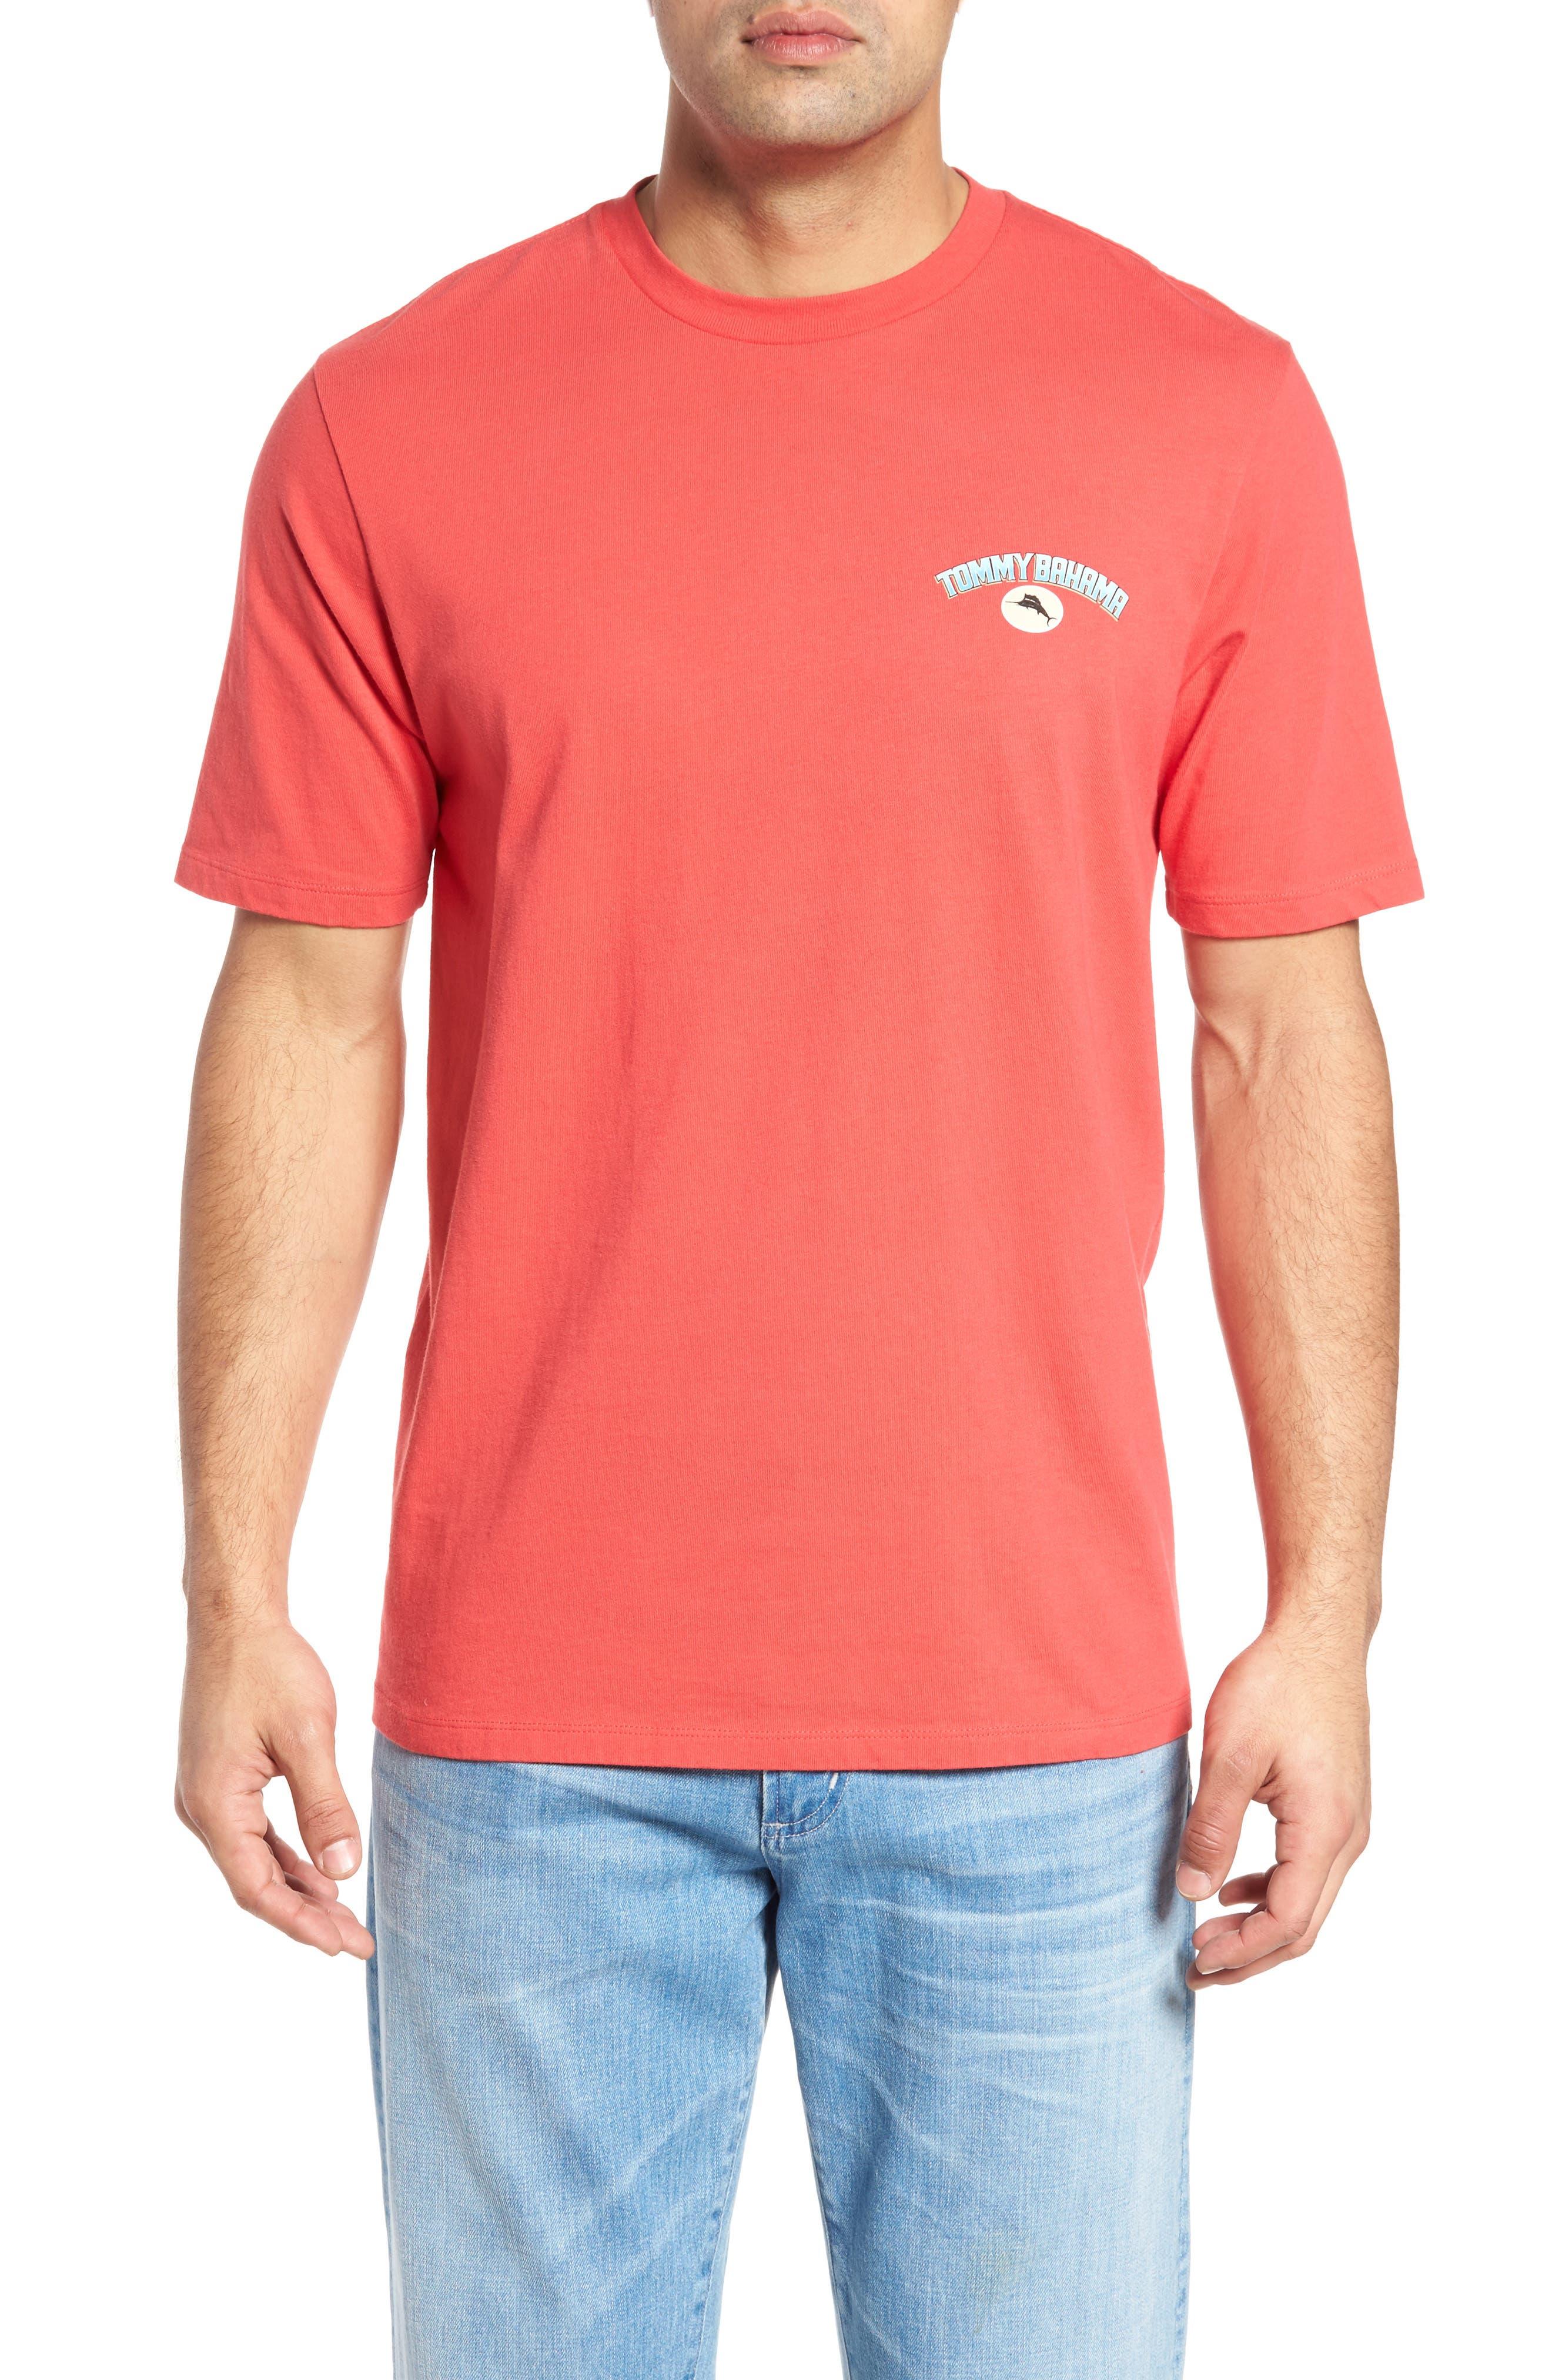 Grate Outdoors T-Shirt,                             Main thumbnail 1, color,                             600